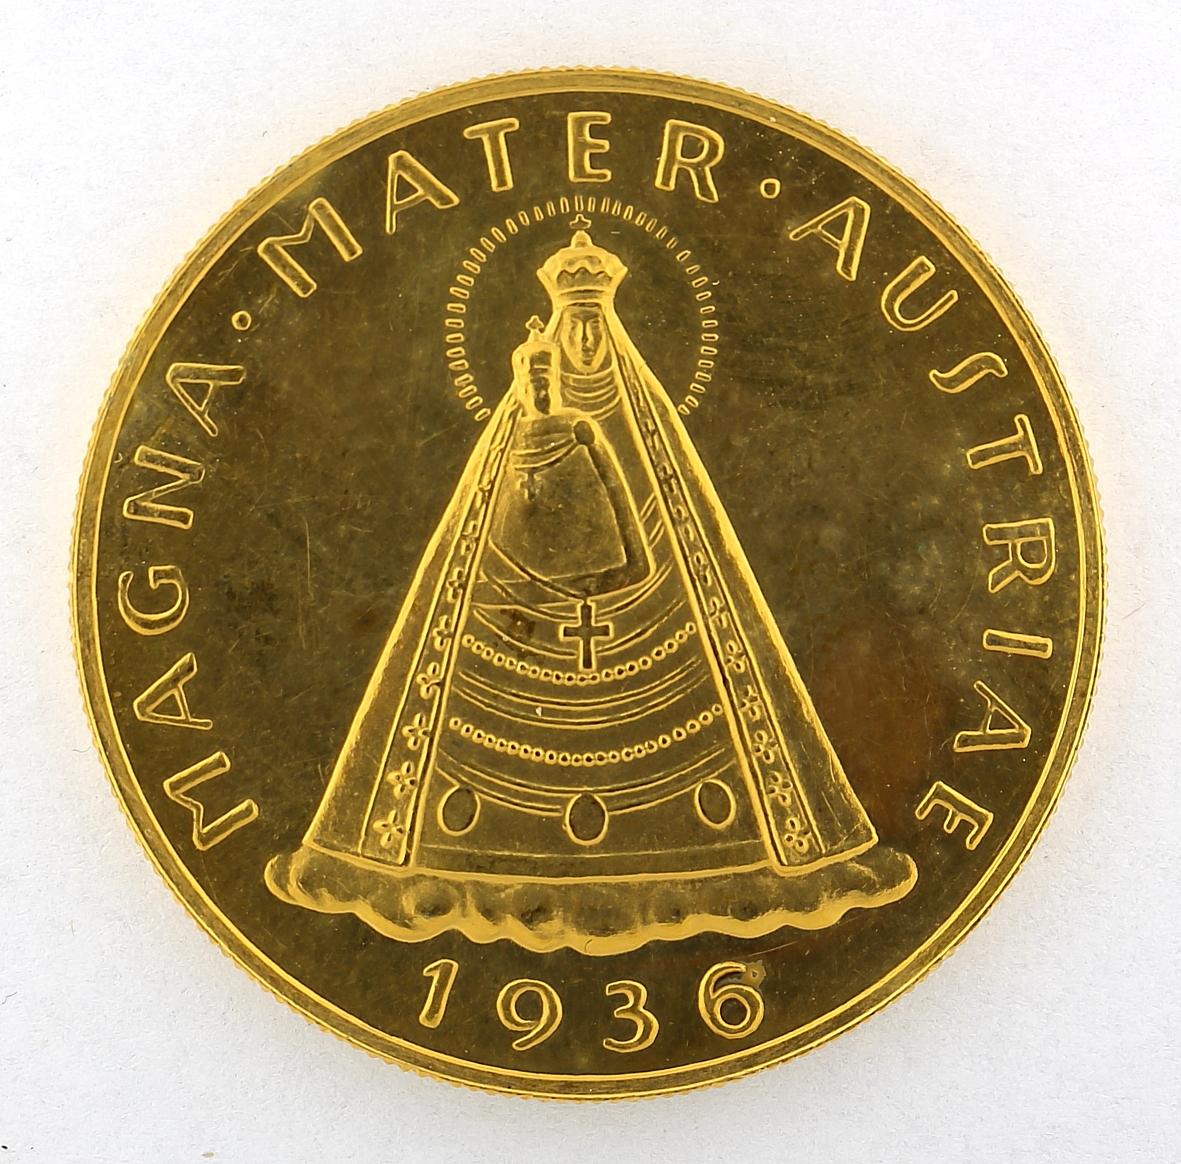 Fileösterreich 100 Schilling Münze 1936 Reversjpg Wikimedia